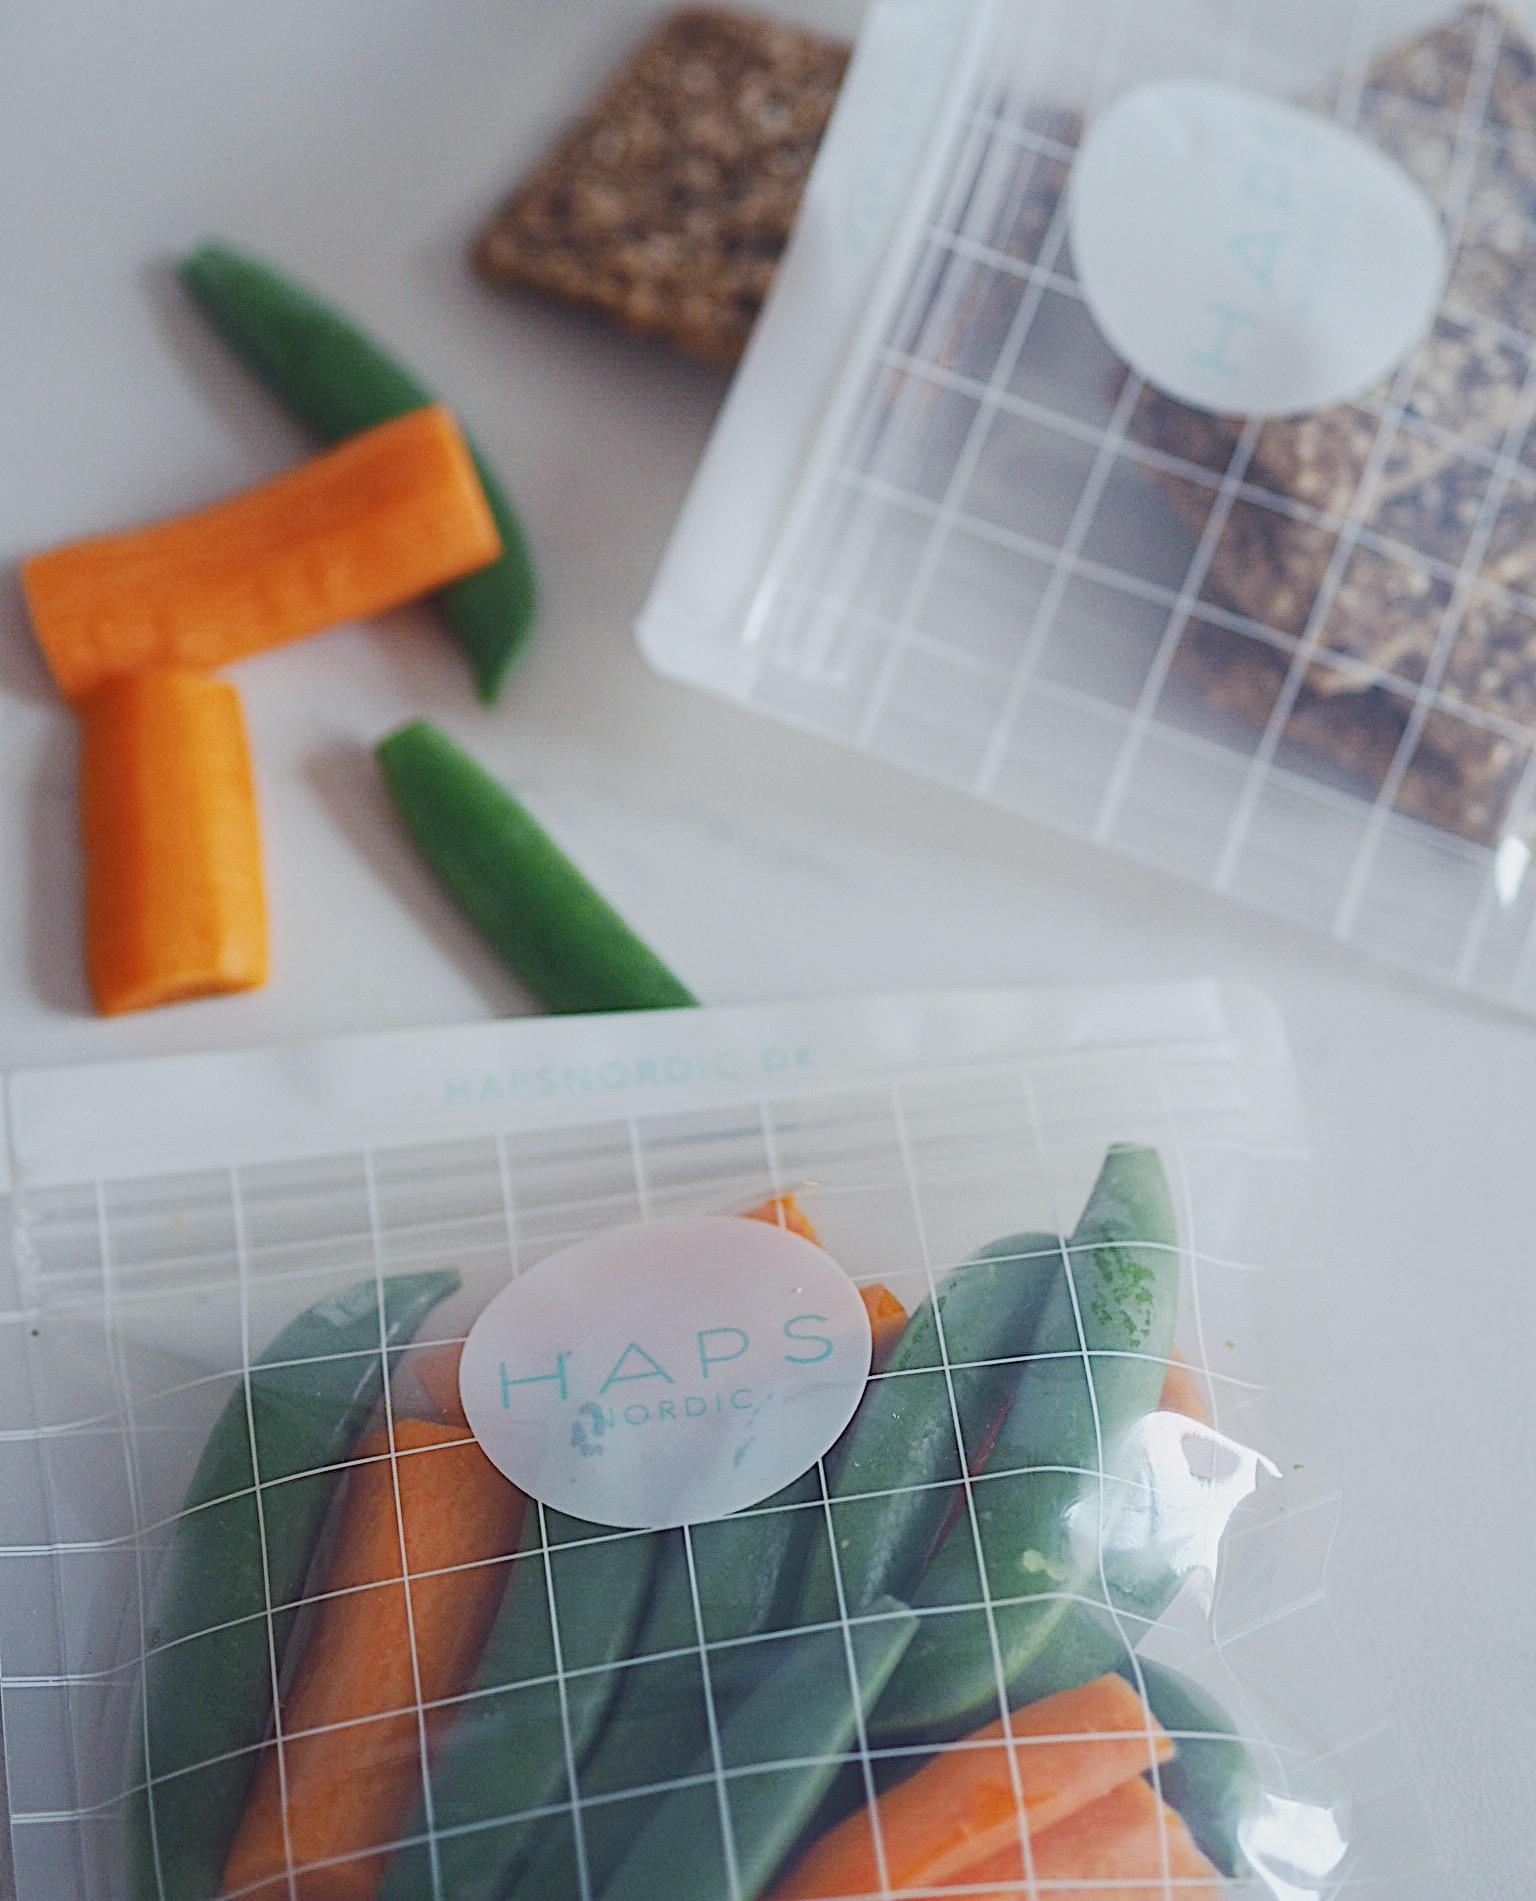 5 miljøvenlige alternativer til fryseposer